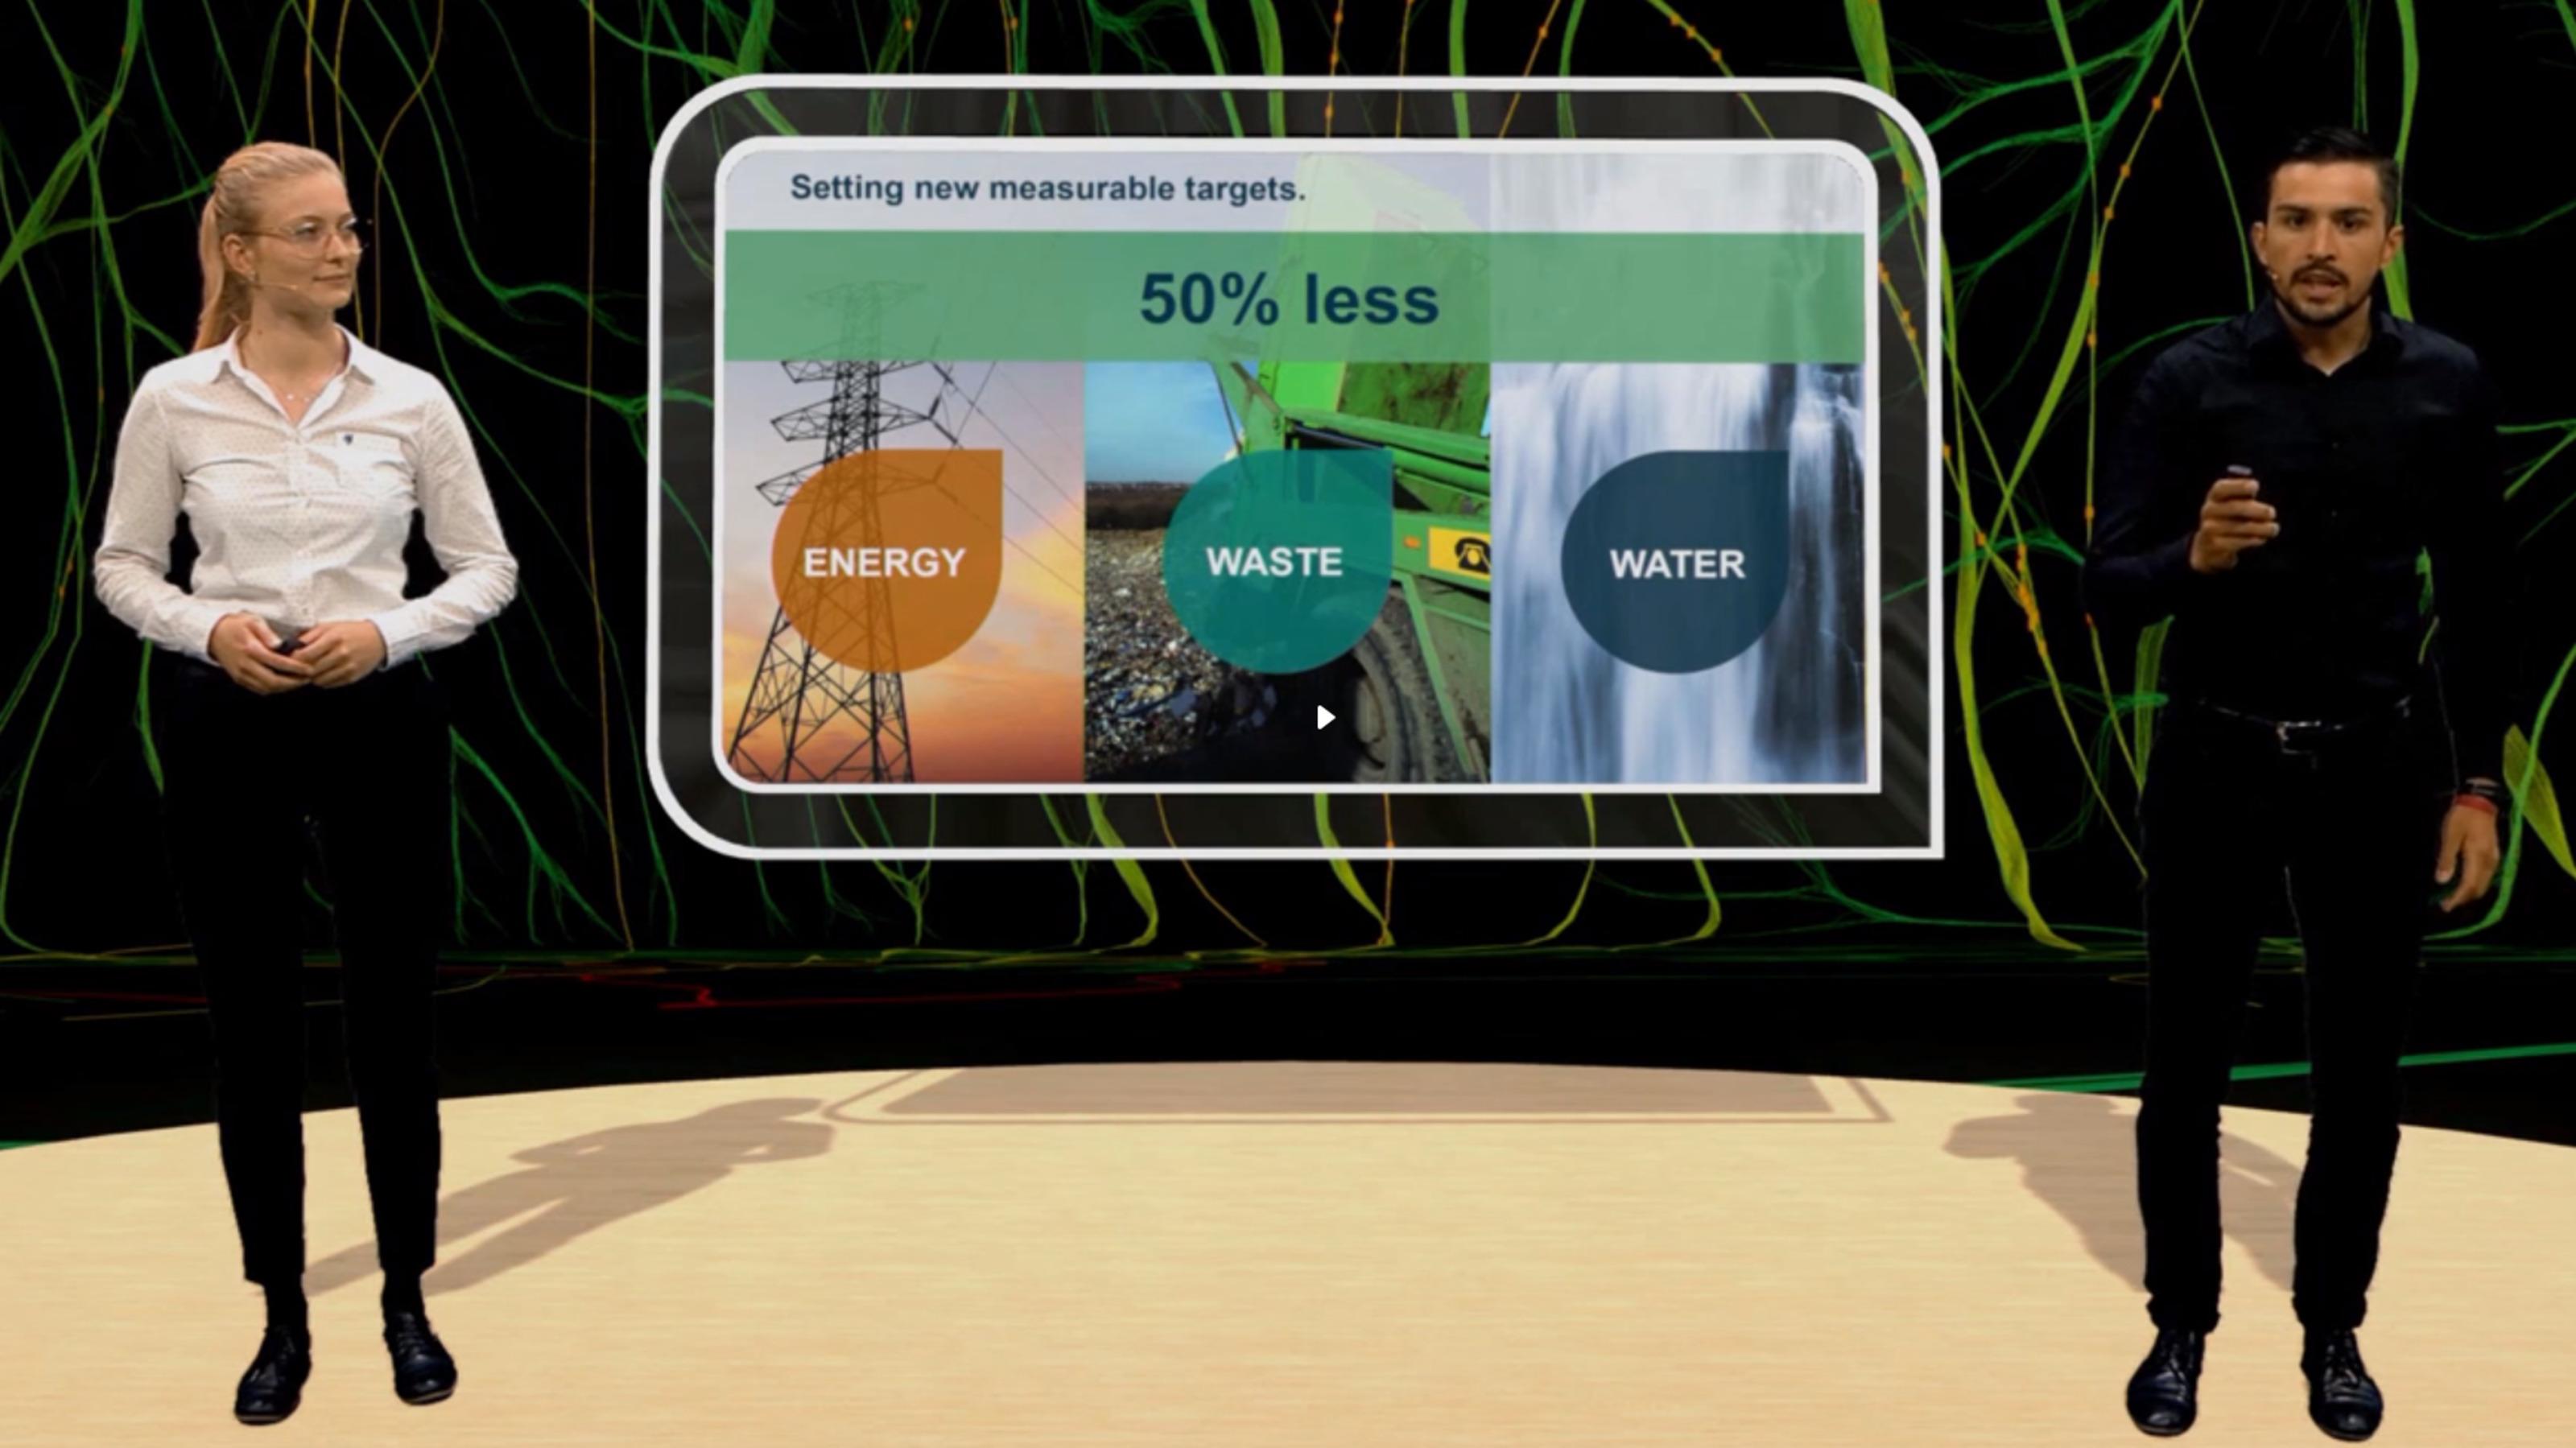 Virtual presentation: We clarify our 50/50/50 sustainability goals